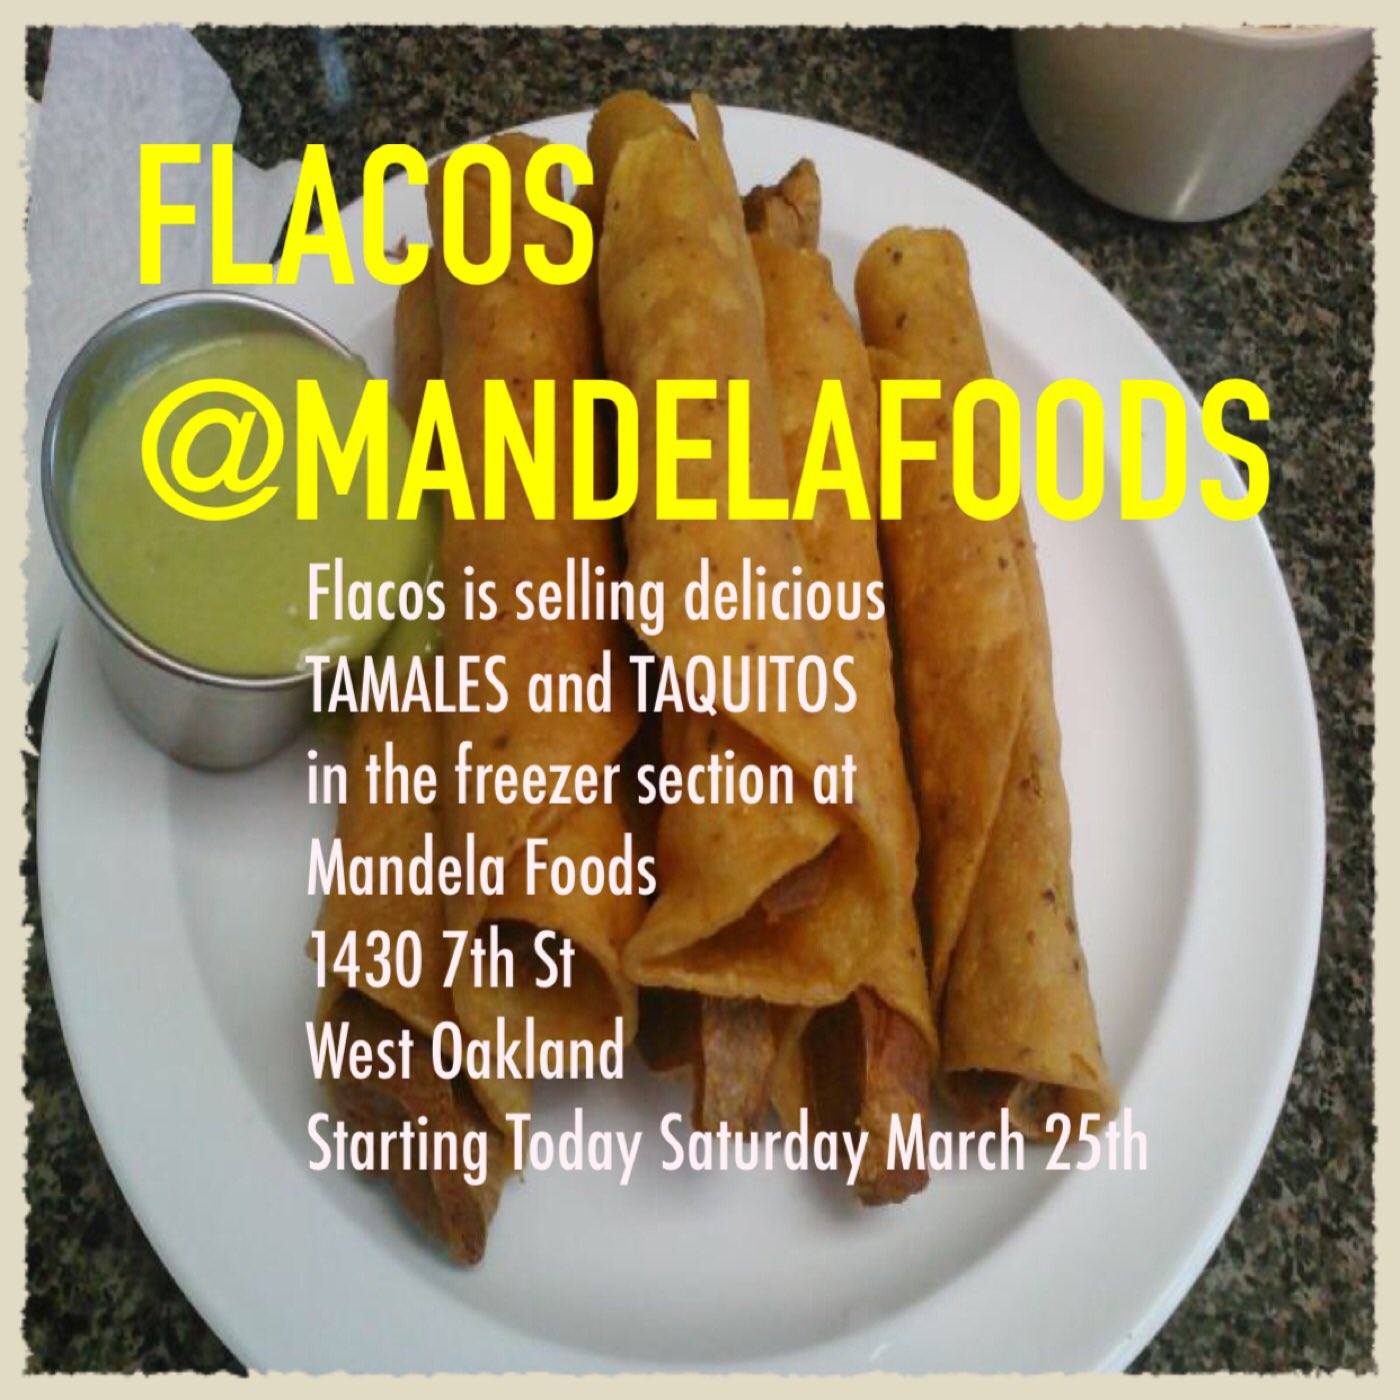 #flacos #feedlarevolucion @MandelaFoodsOAK #organic #vegan #eastbay #510 #westoakland #berkeley #mexicanfood #organico #vegano #comida https://t.co/aZlkgwtA9o